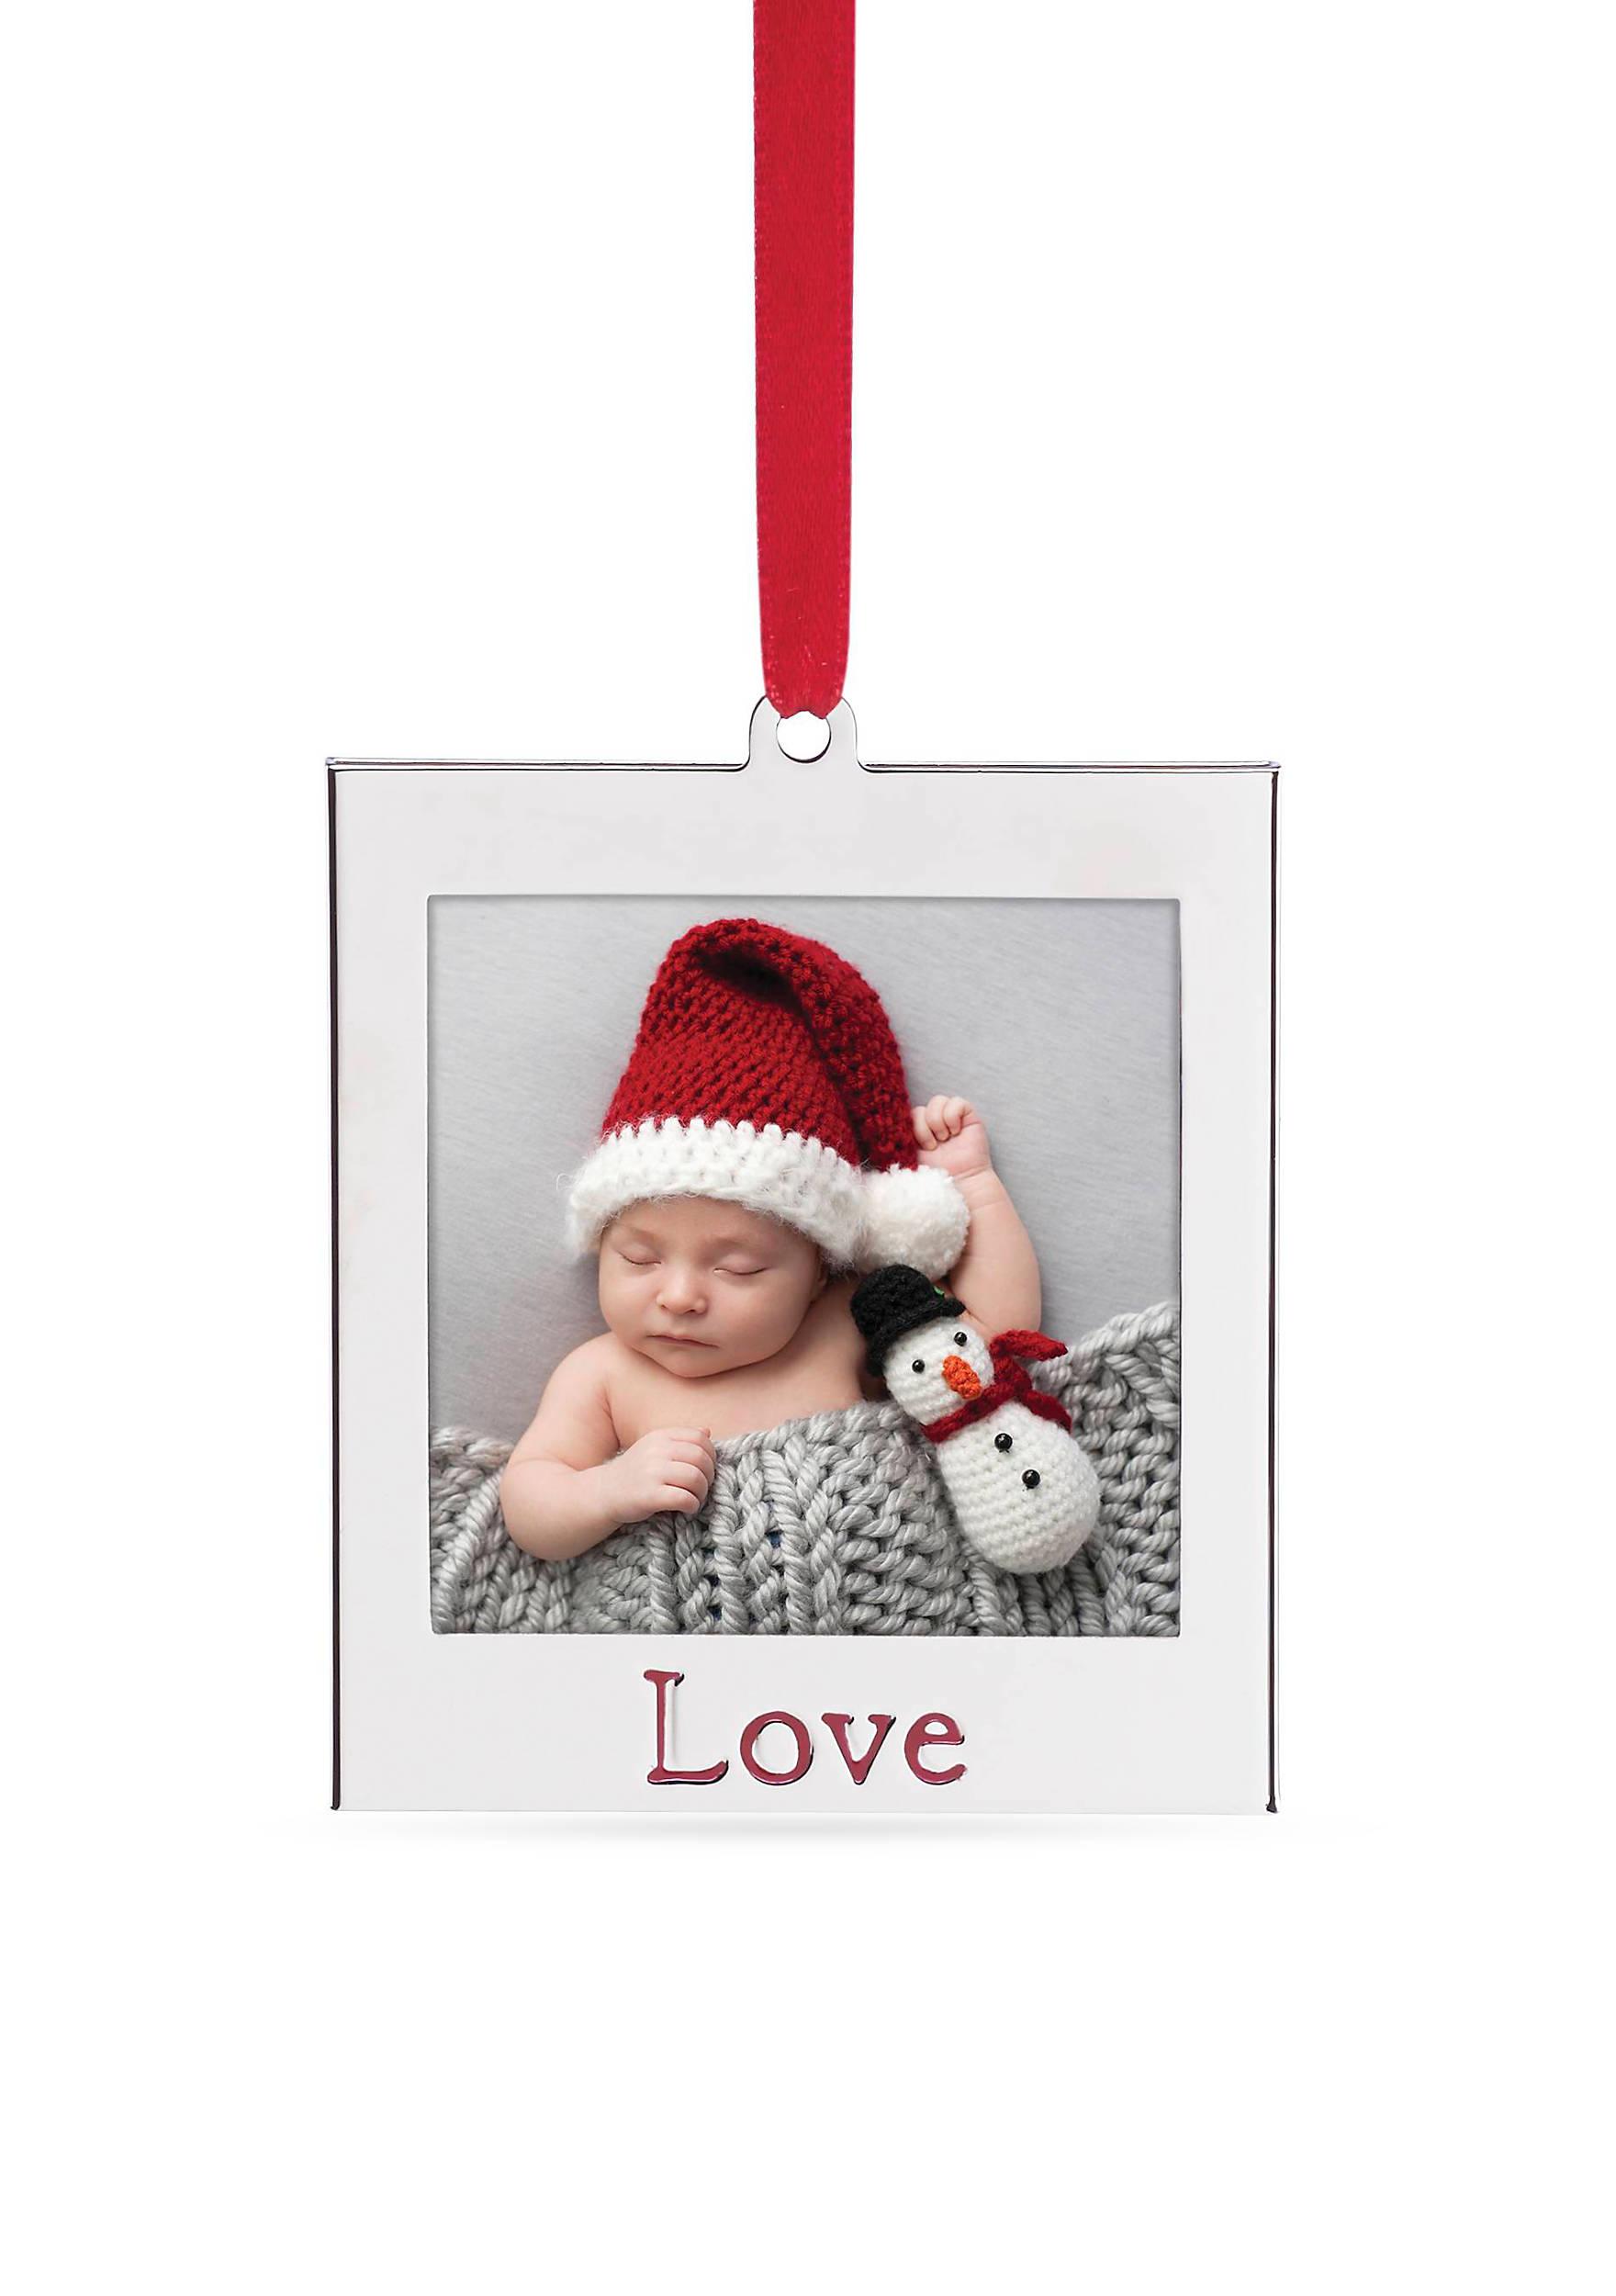 Lenox love silver picture frame ornament belk images jeuxipadfo Image collections